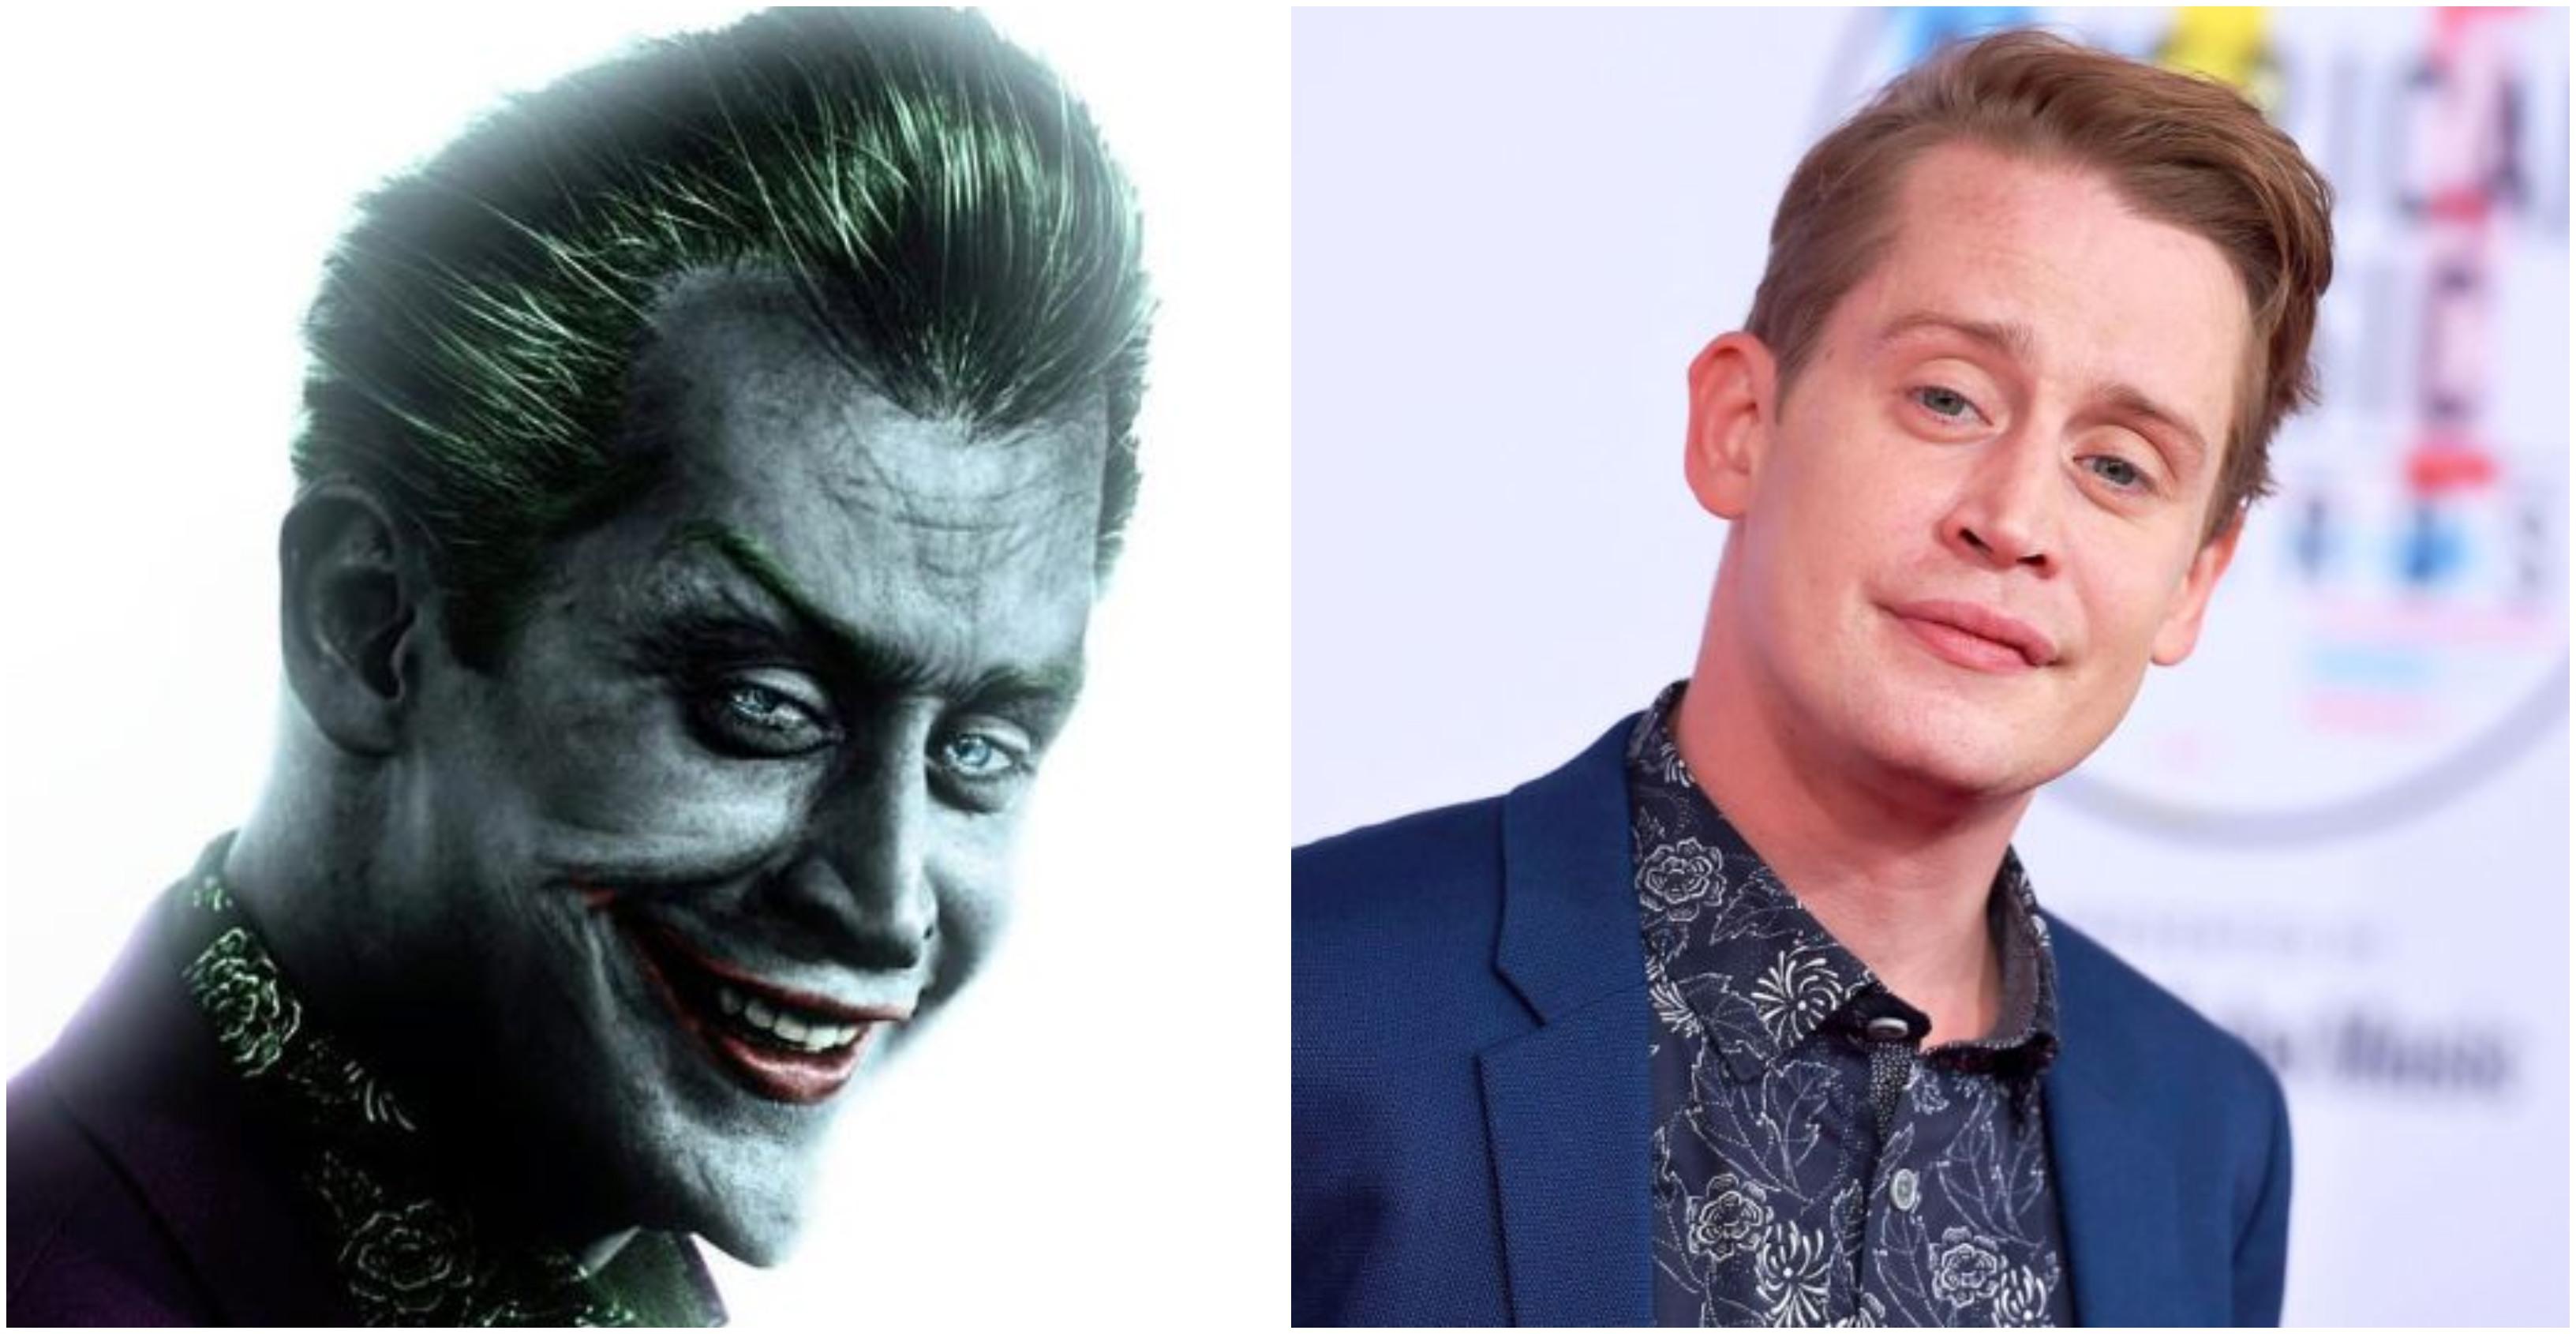 Macaulay Culkin prossimo Joker in The Batman? Alcuni fan lo vorrebbero